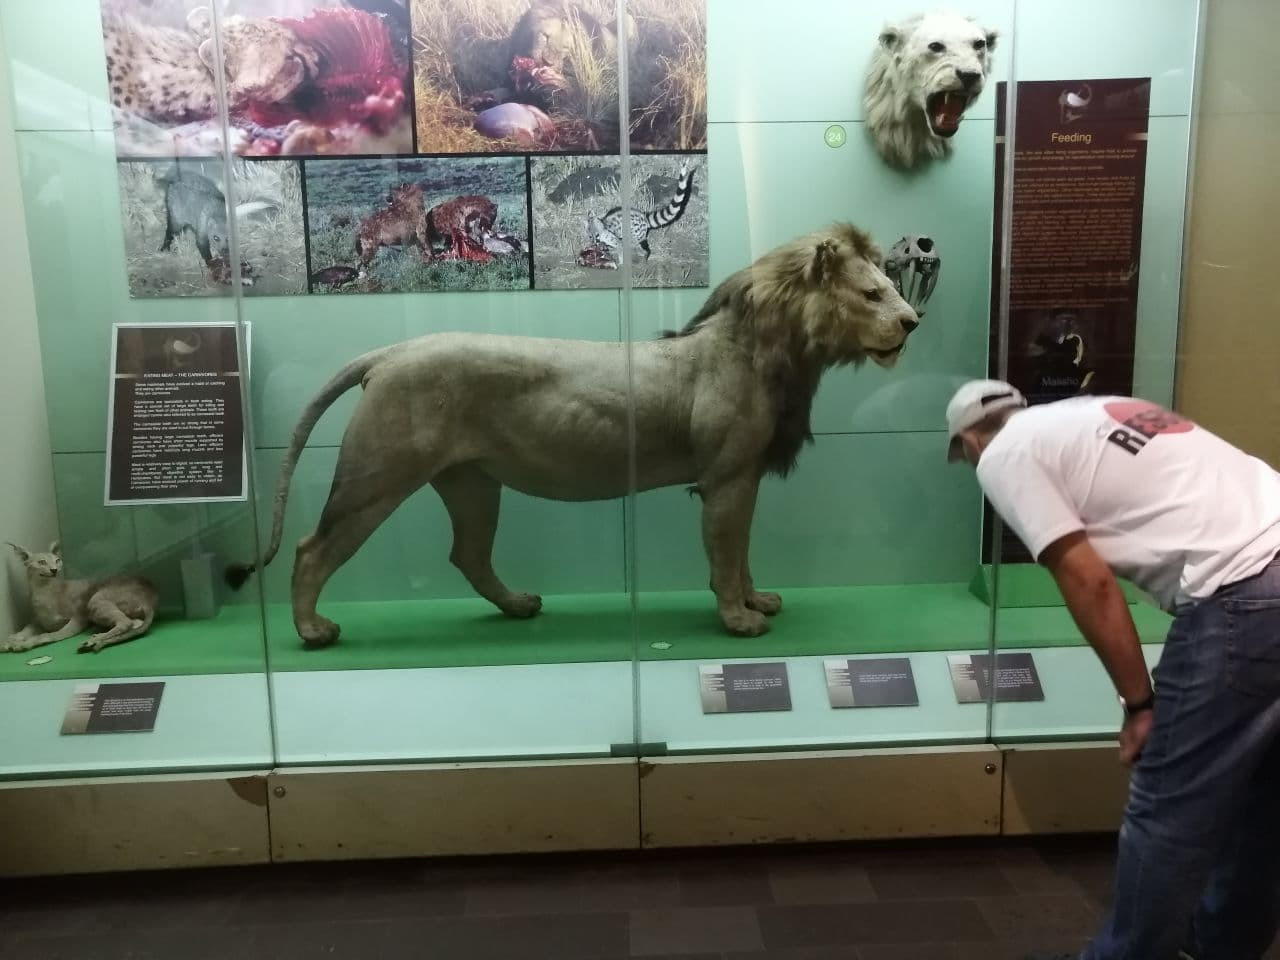 7Q7RU National Museum Nairobi, Kenya Image 8